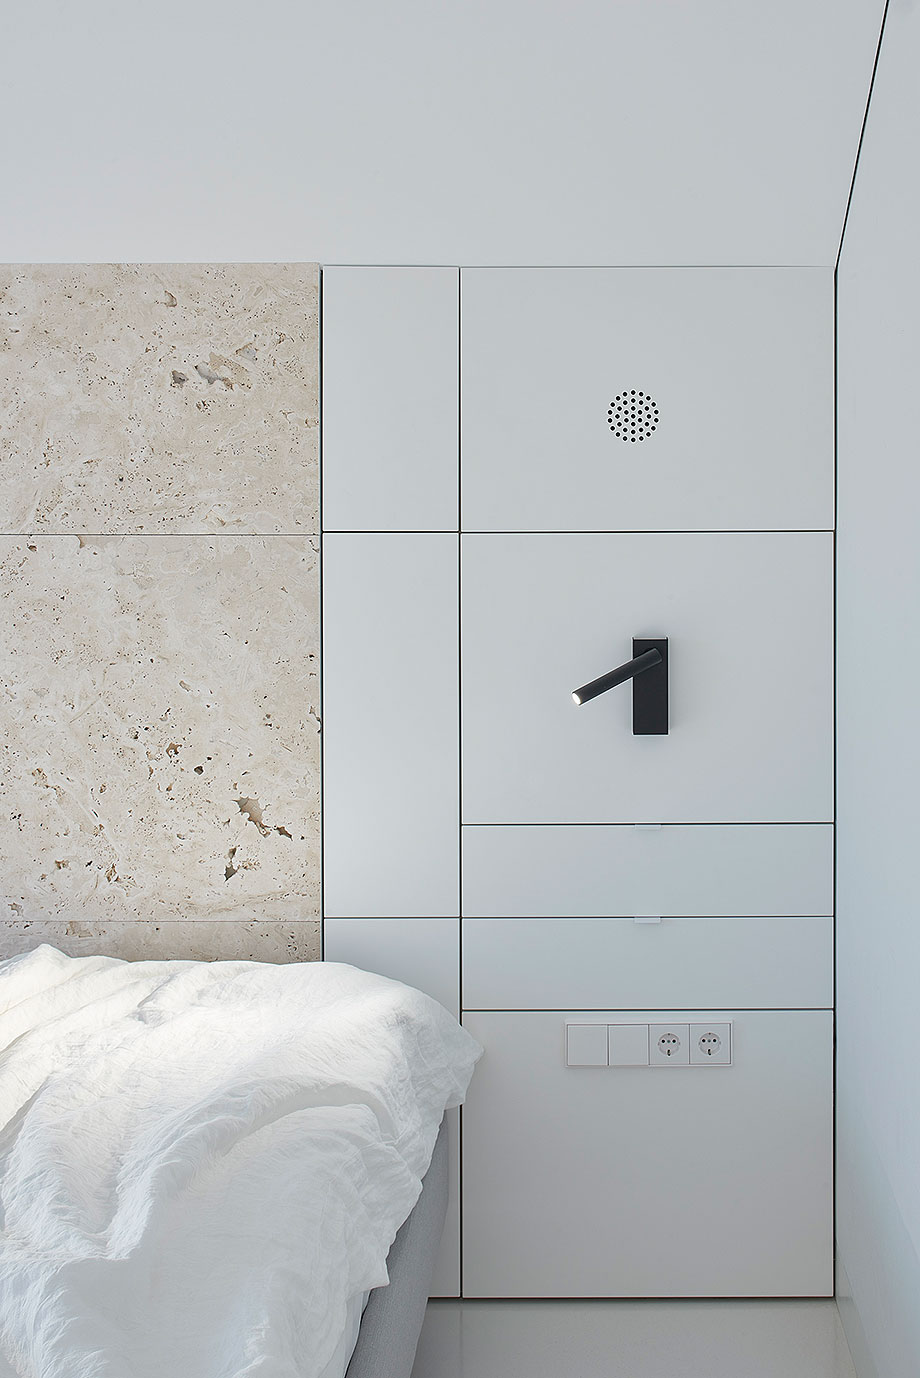 apartamento con un muro de piedra revestido con travertino por 2xj architects (11) - foto darius petrulaitis